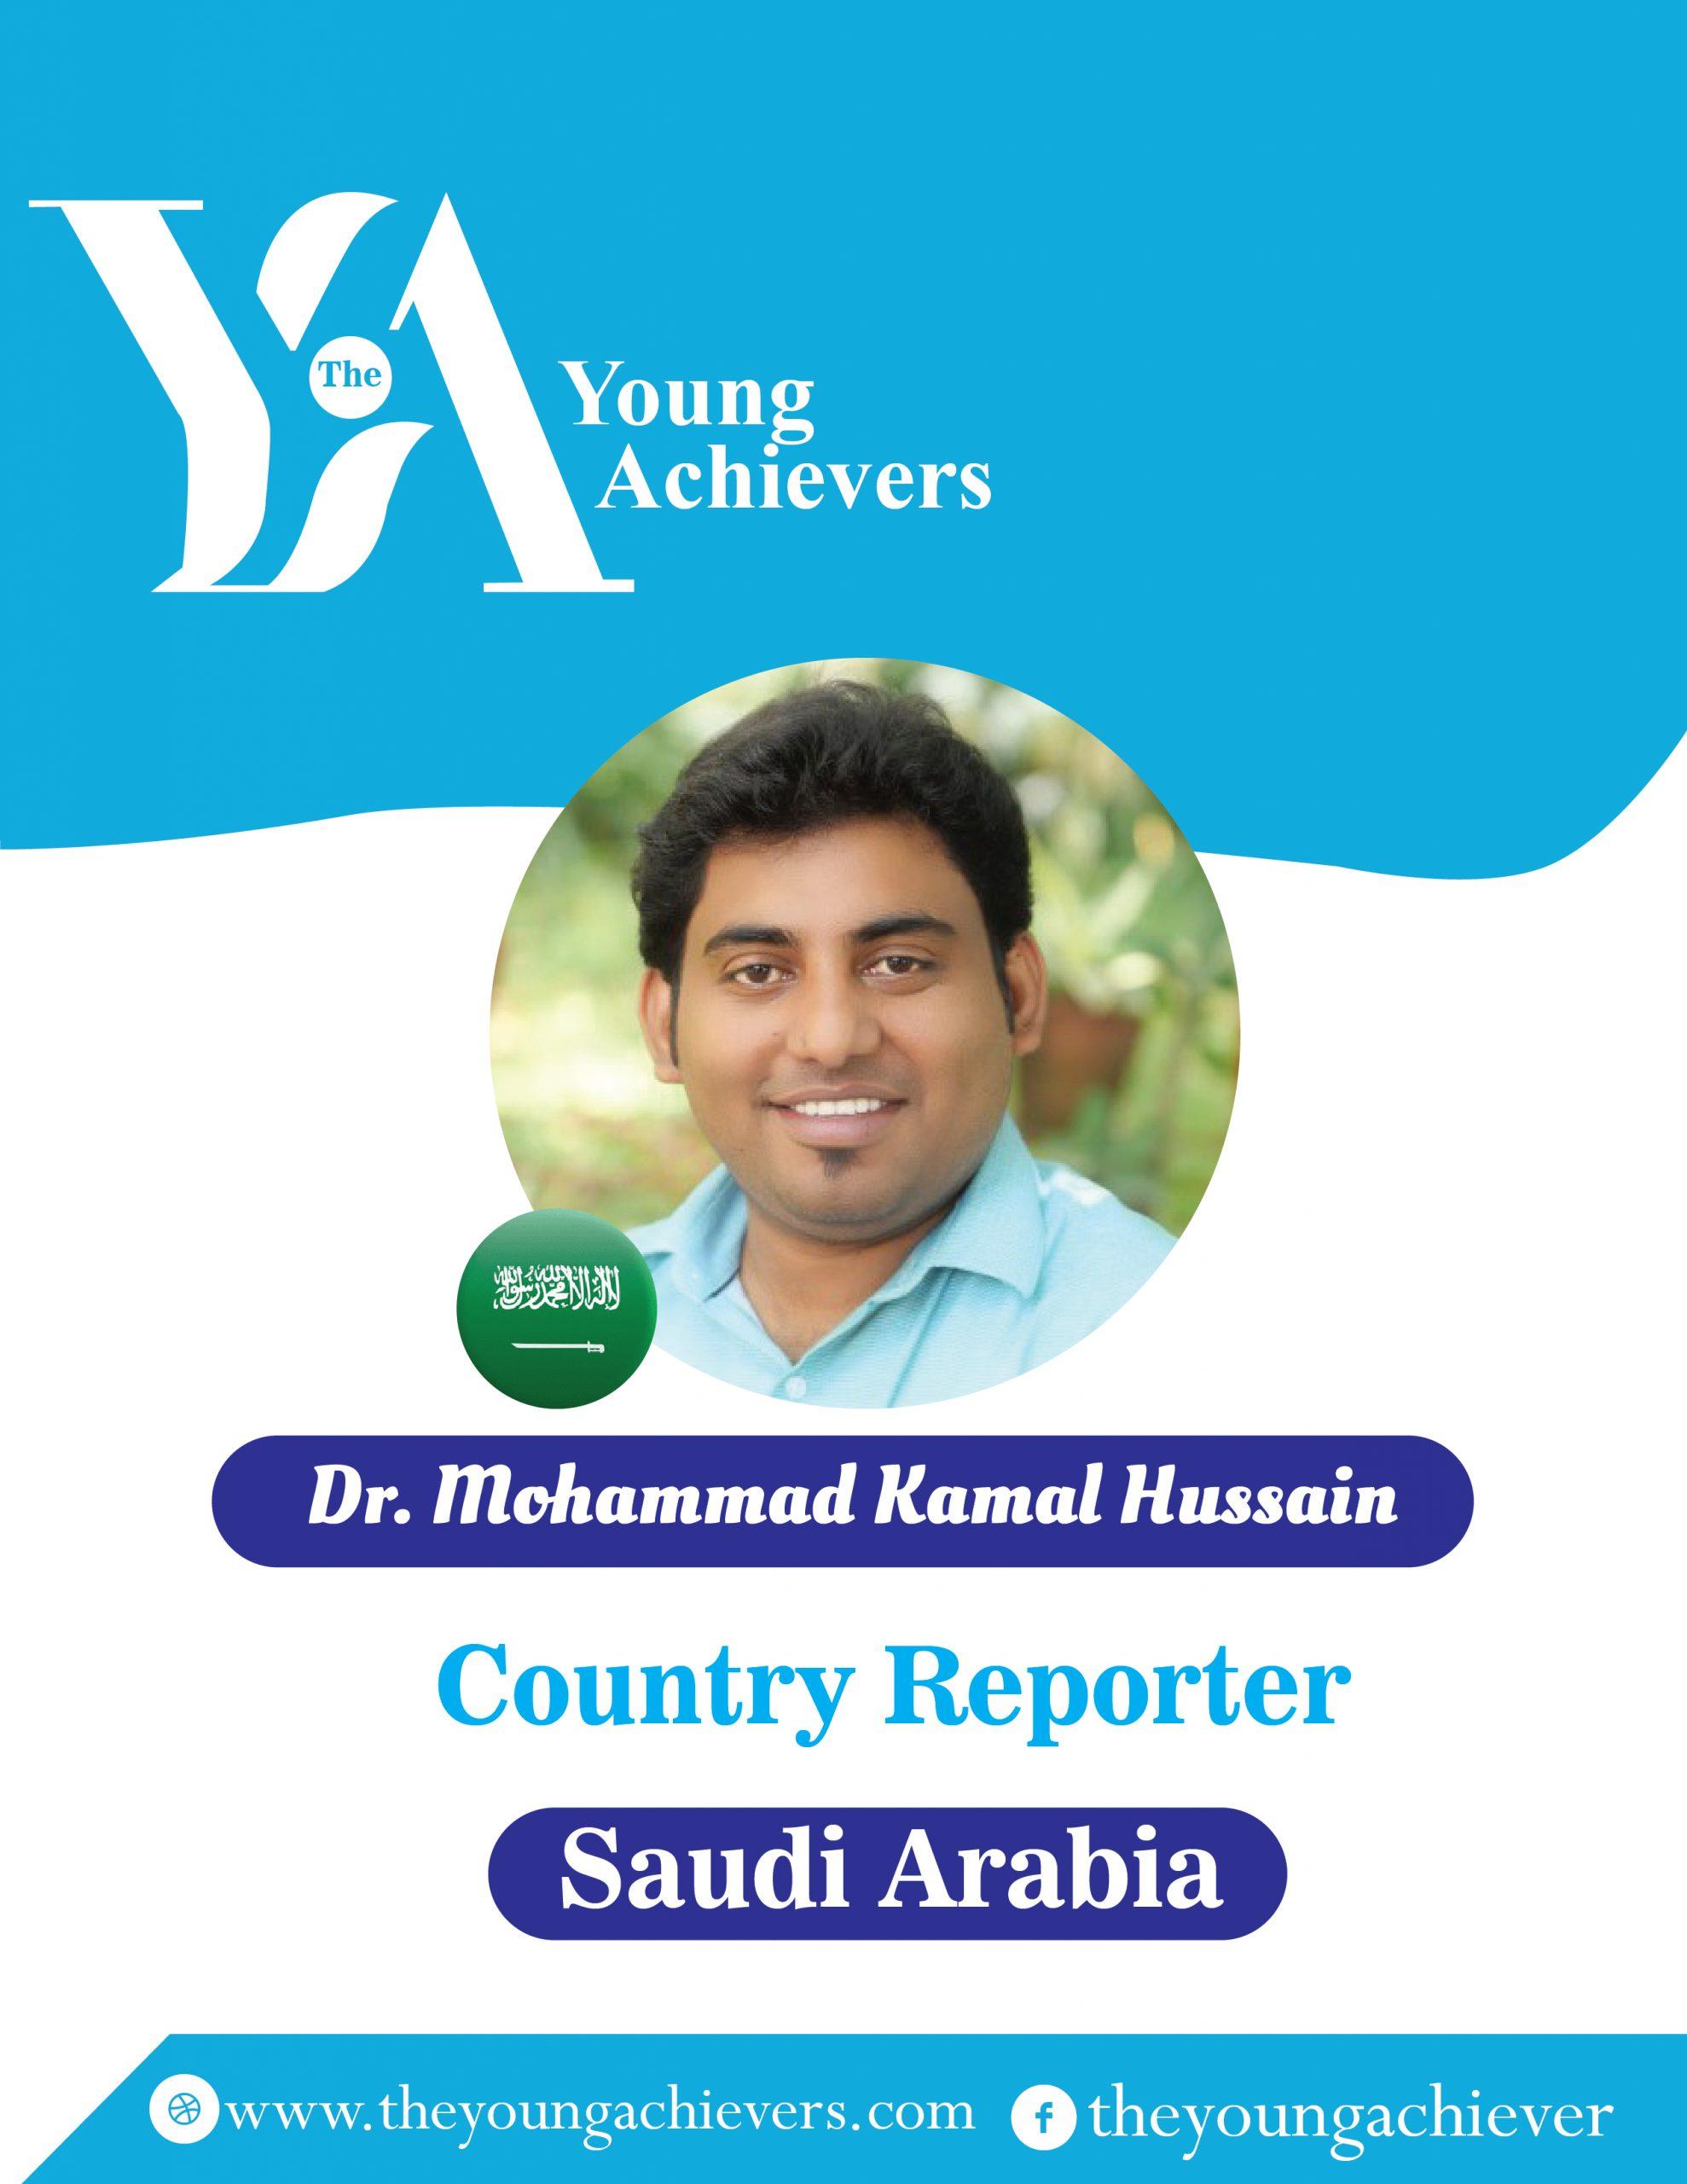 Dr. Mohammad Kamal Hussain